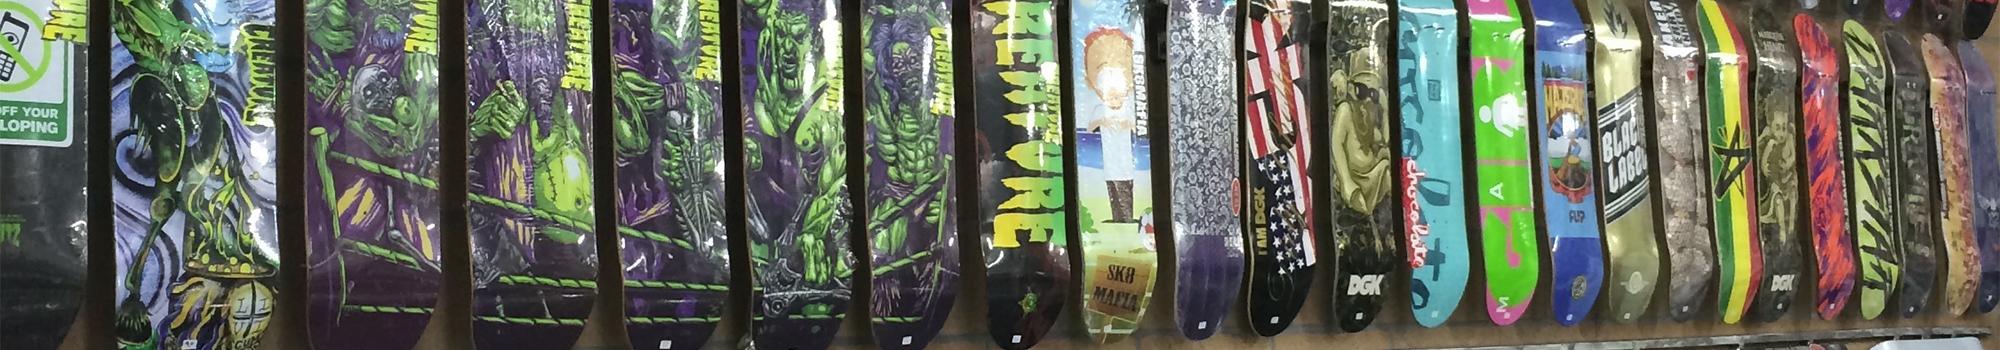 Skateboard_Wall_03